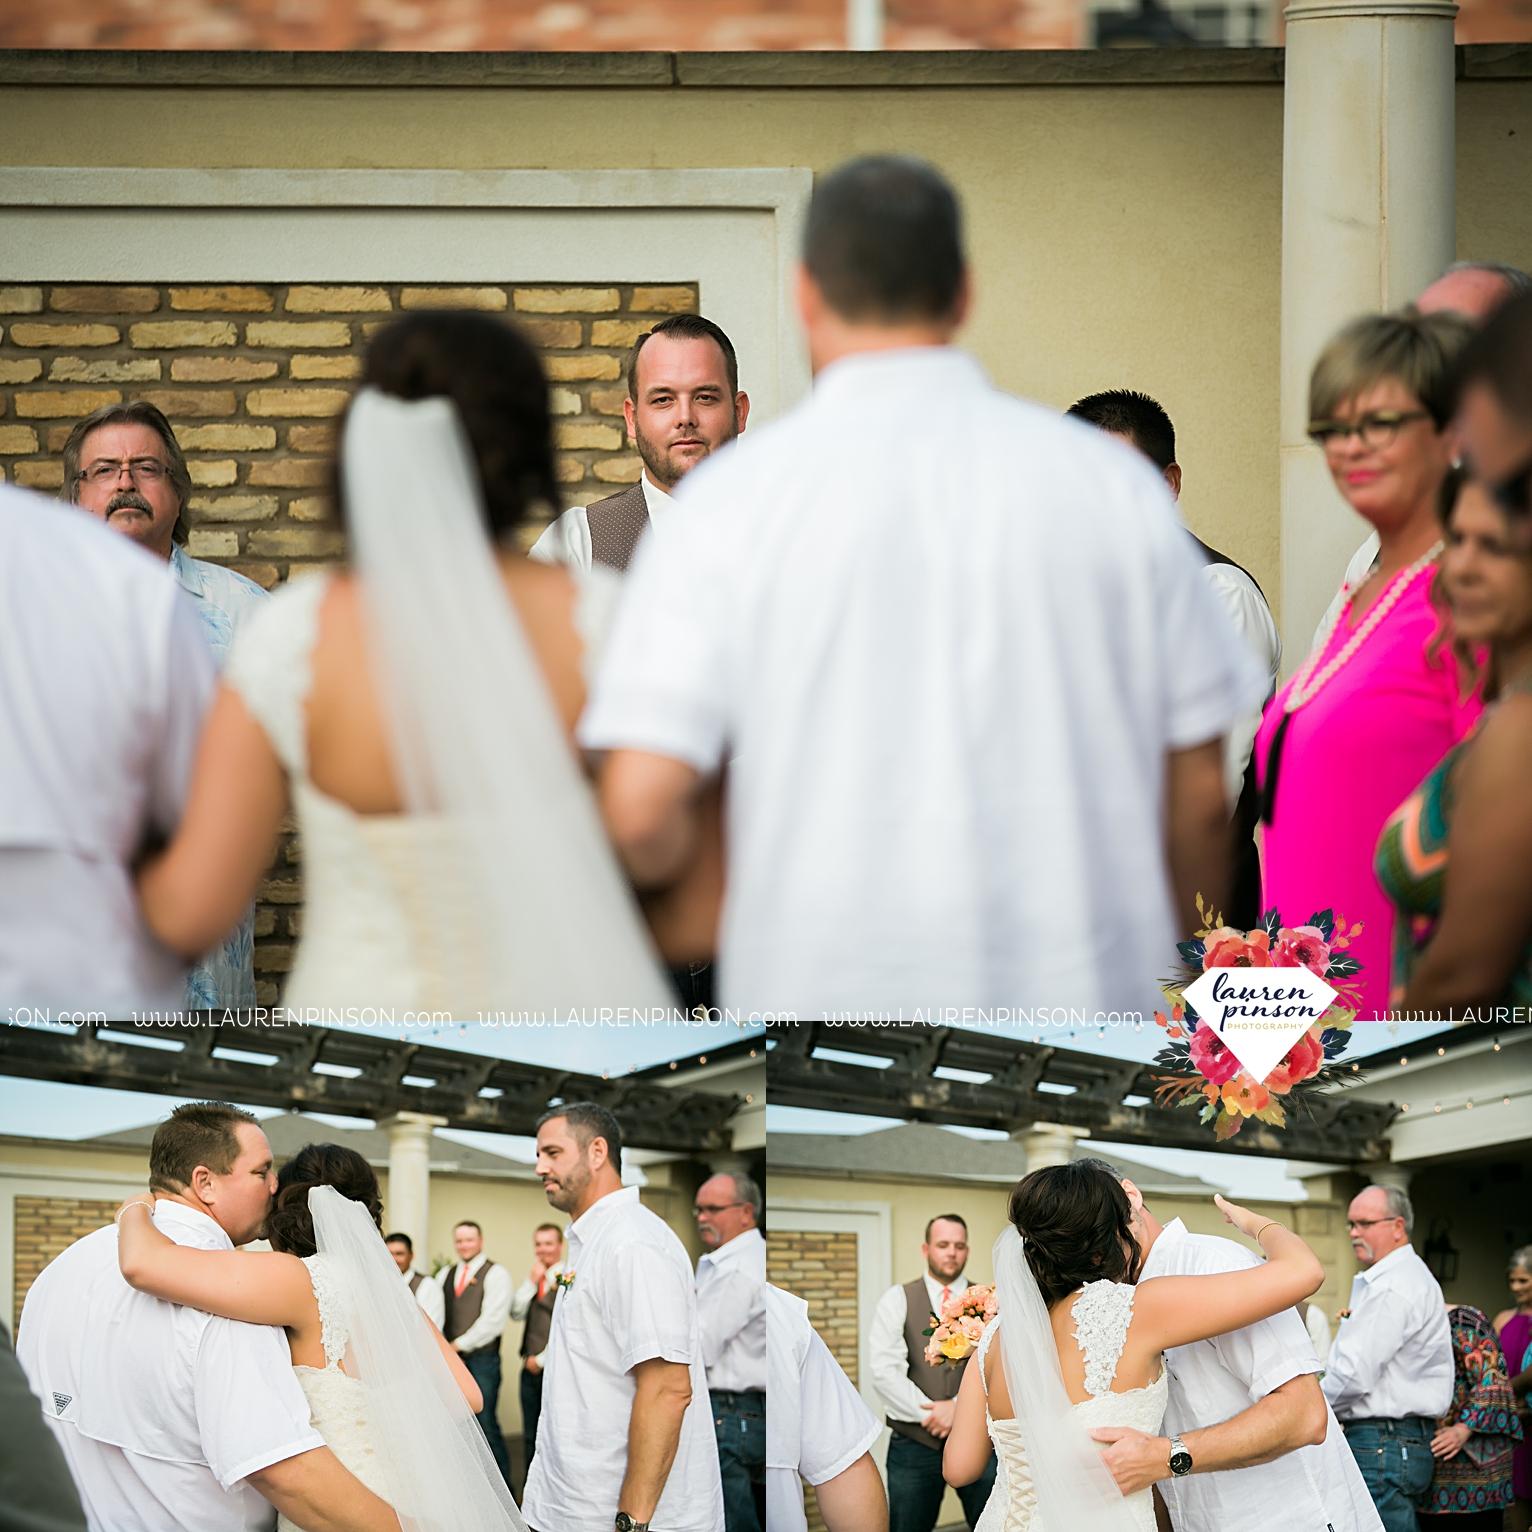 wichita-falls-texas-wedding-photographer-wellington-on-the-lake-with-mayfield-events_2970.jpg